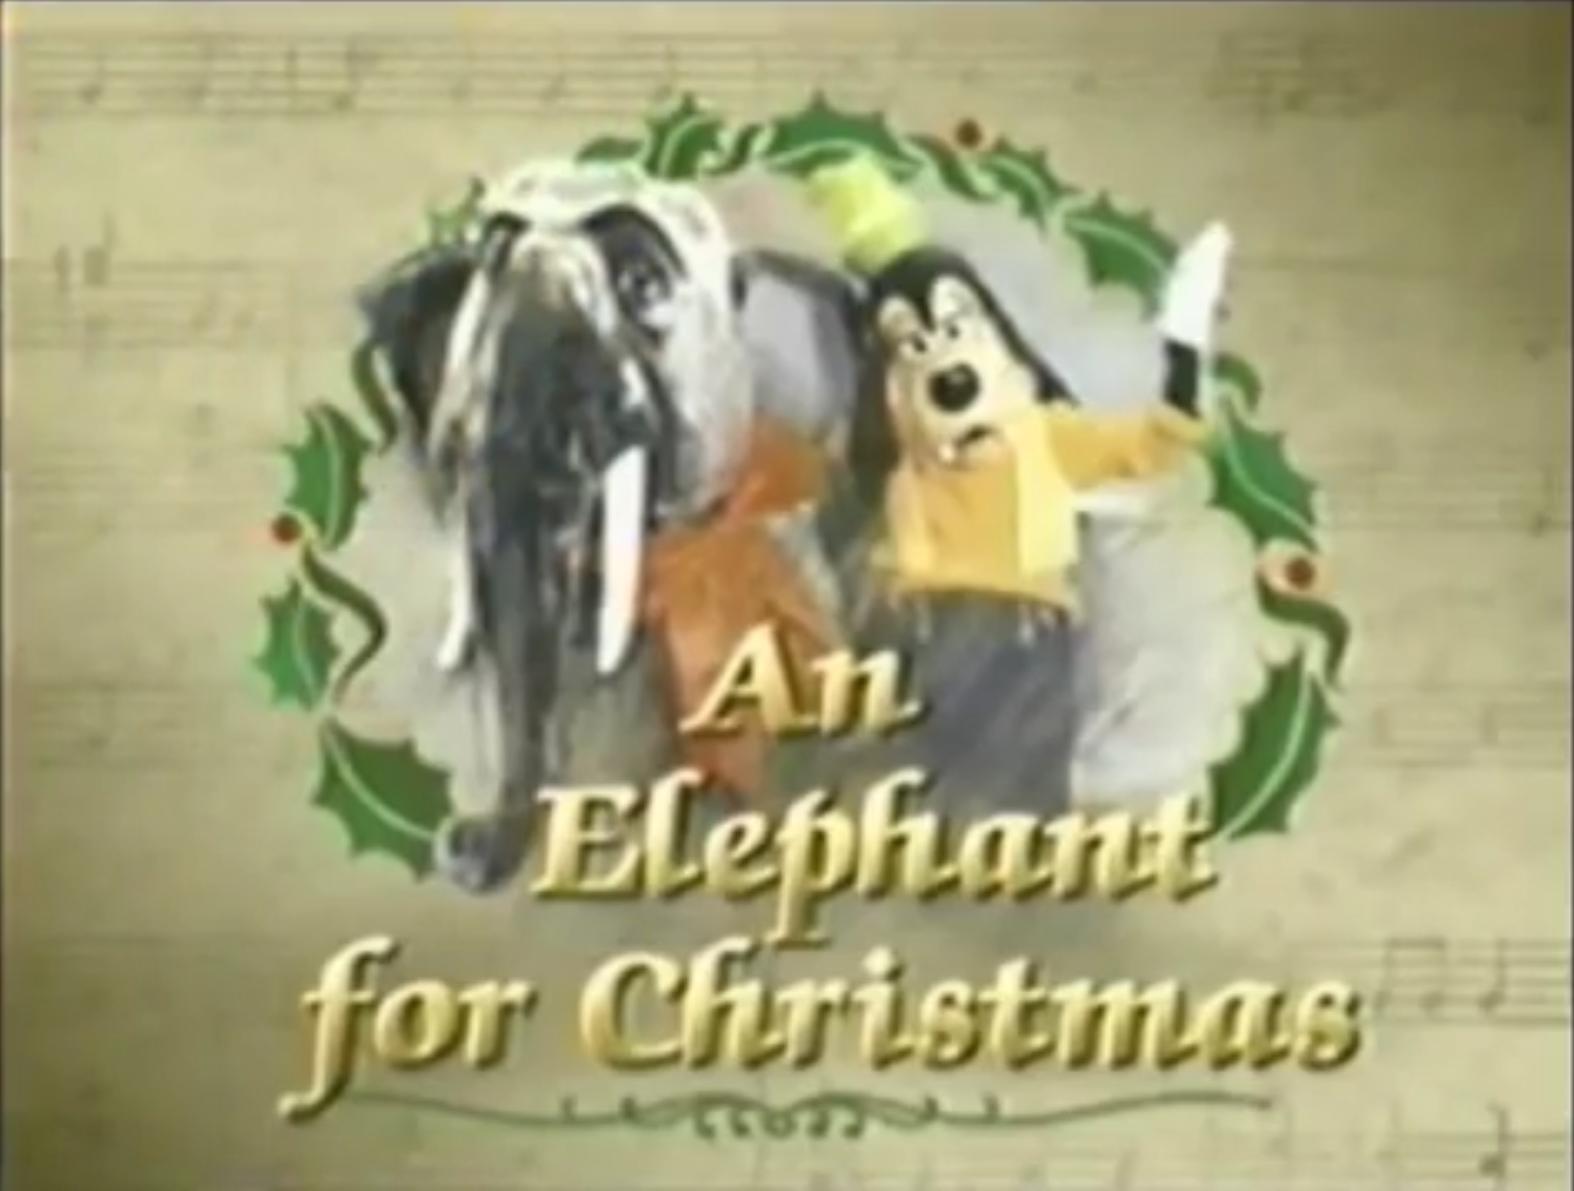 I'd Like to Have an Elephant for Christmas